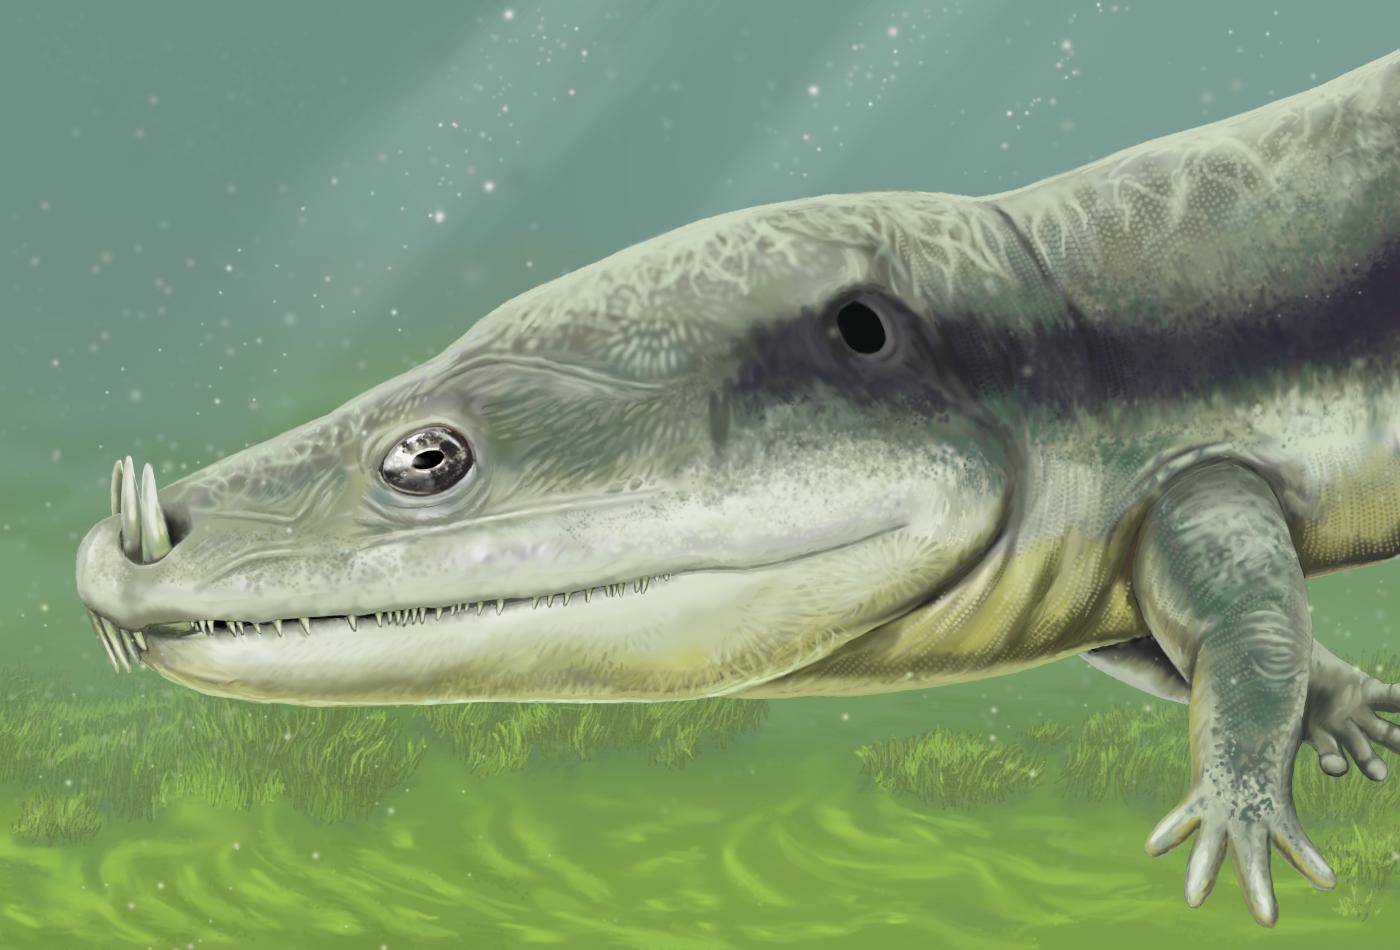 The Marine Reptile Timeline Koryos Writes